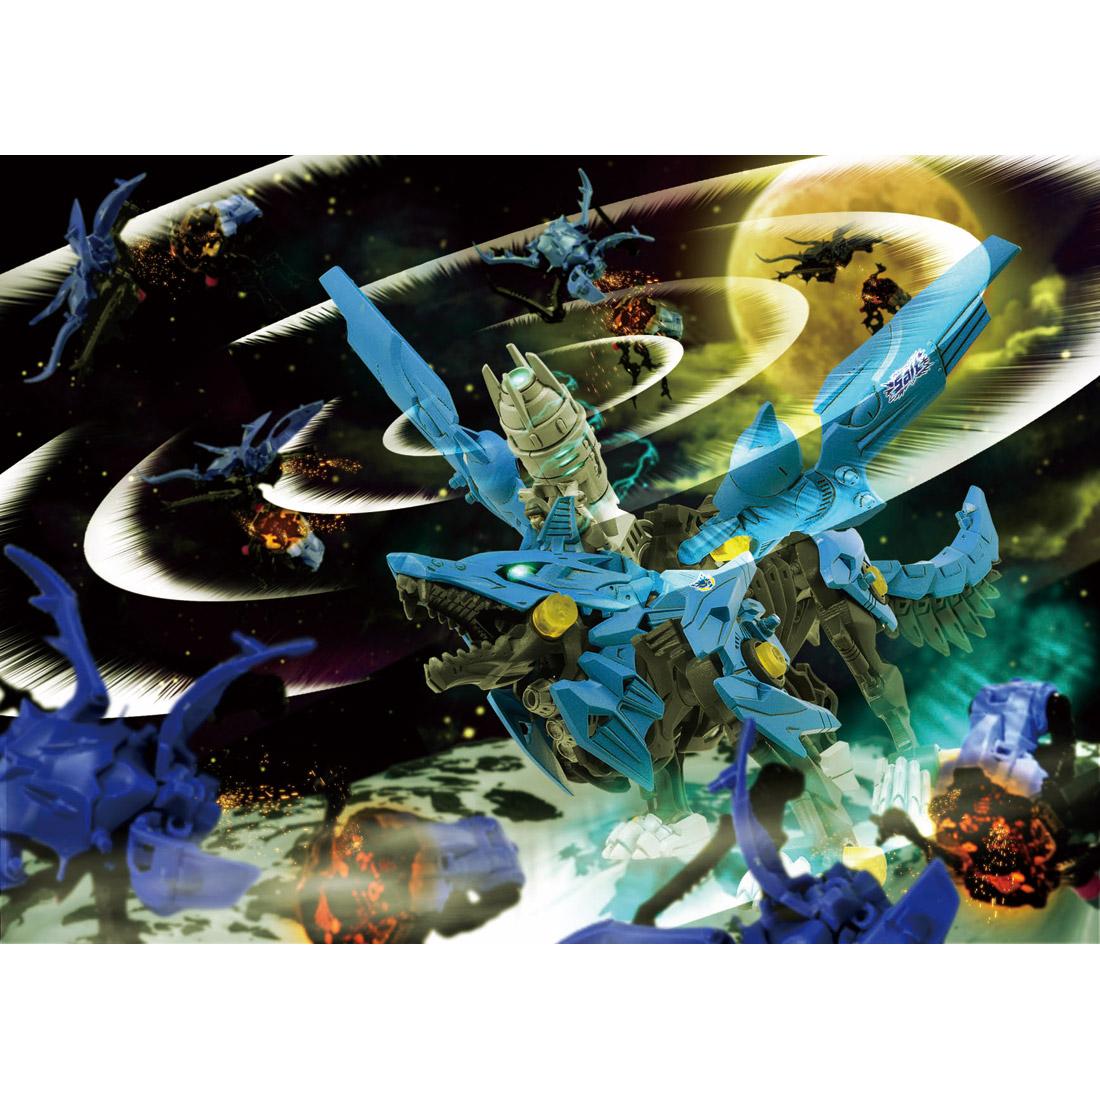 ZOIDS『ZW16 ハンターウルフ』ゾイドワイルド 組立キット-009